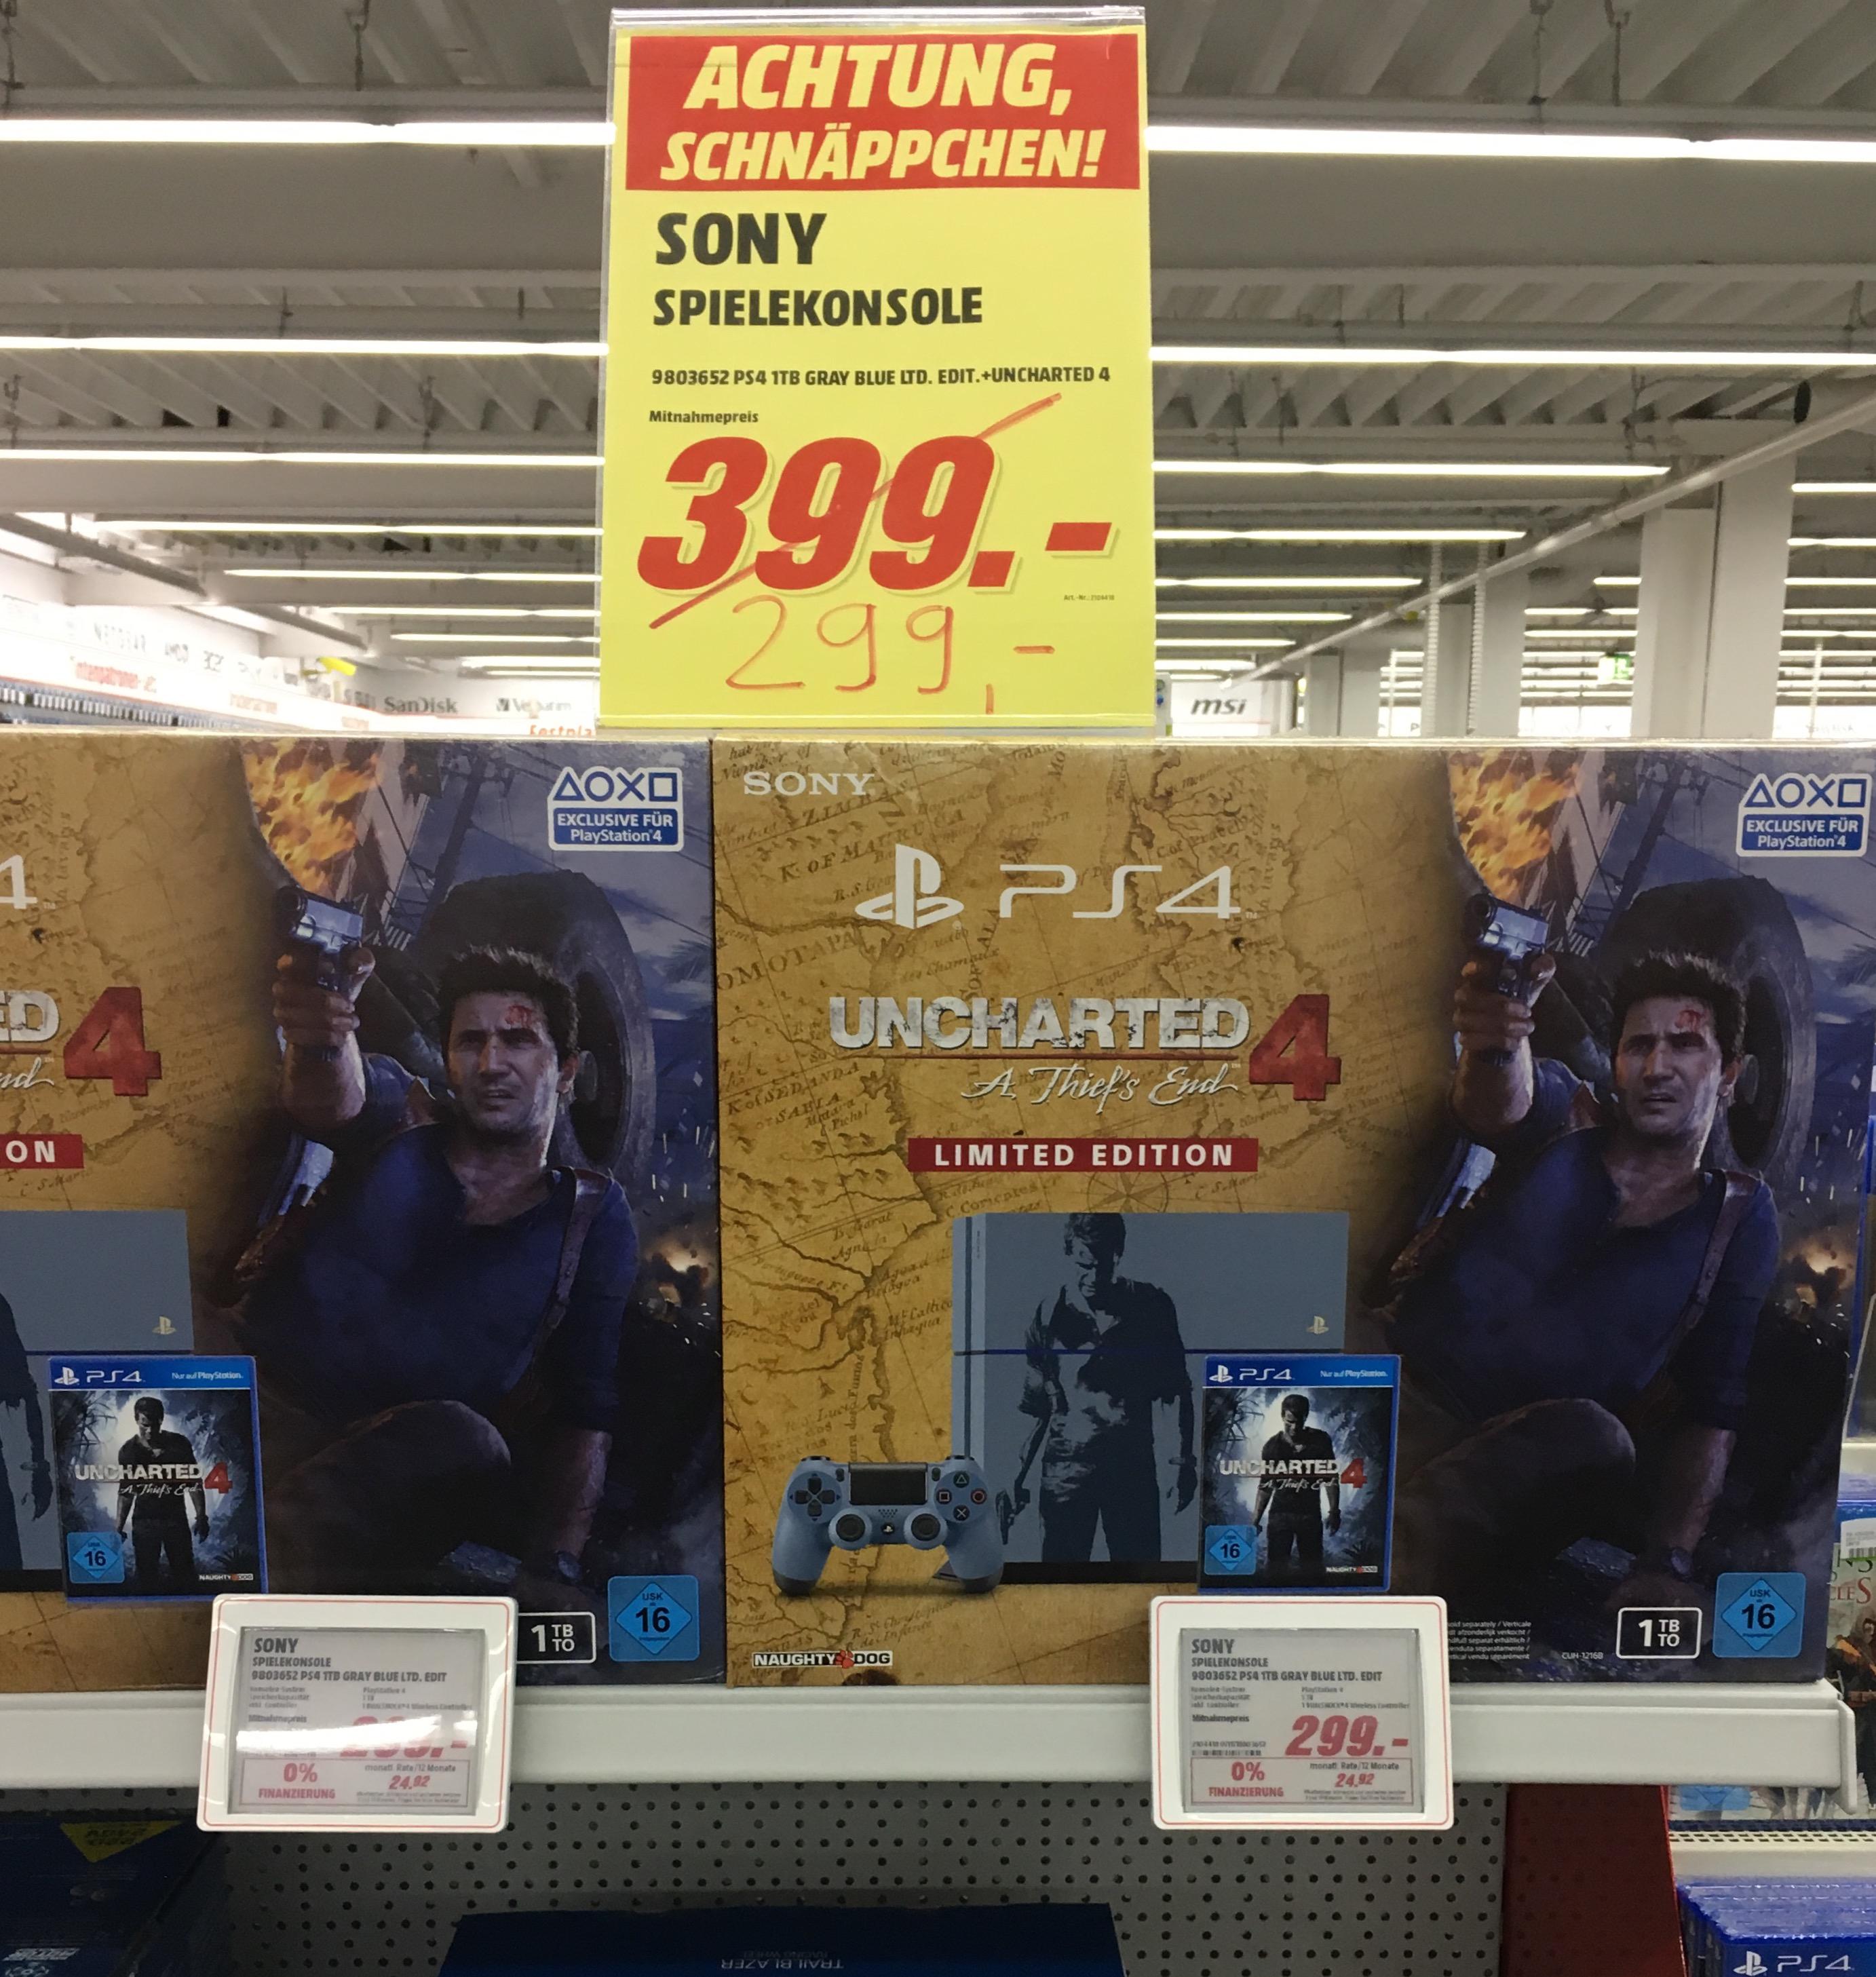 [Lokal Media Markt Singen] Sony PlayStation 4 1TB + Uncharted 4: A Thief's End für 299€